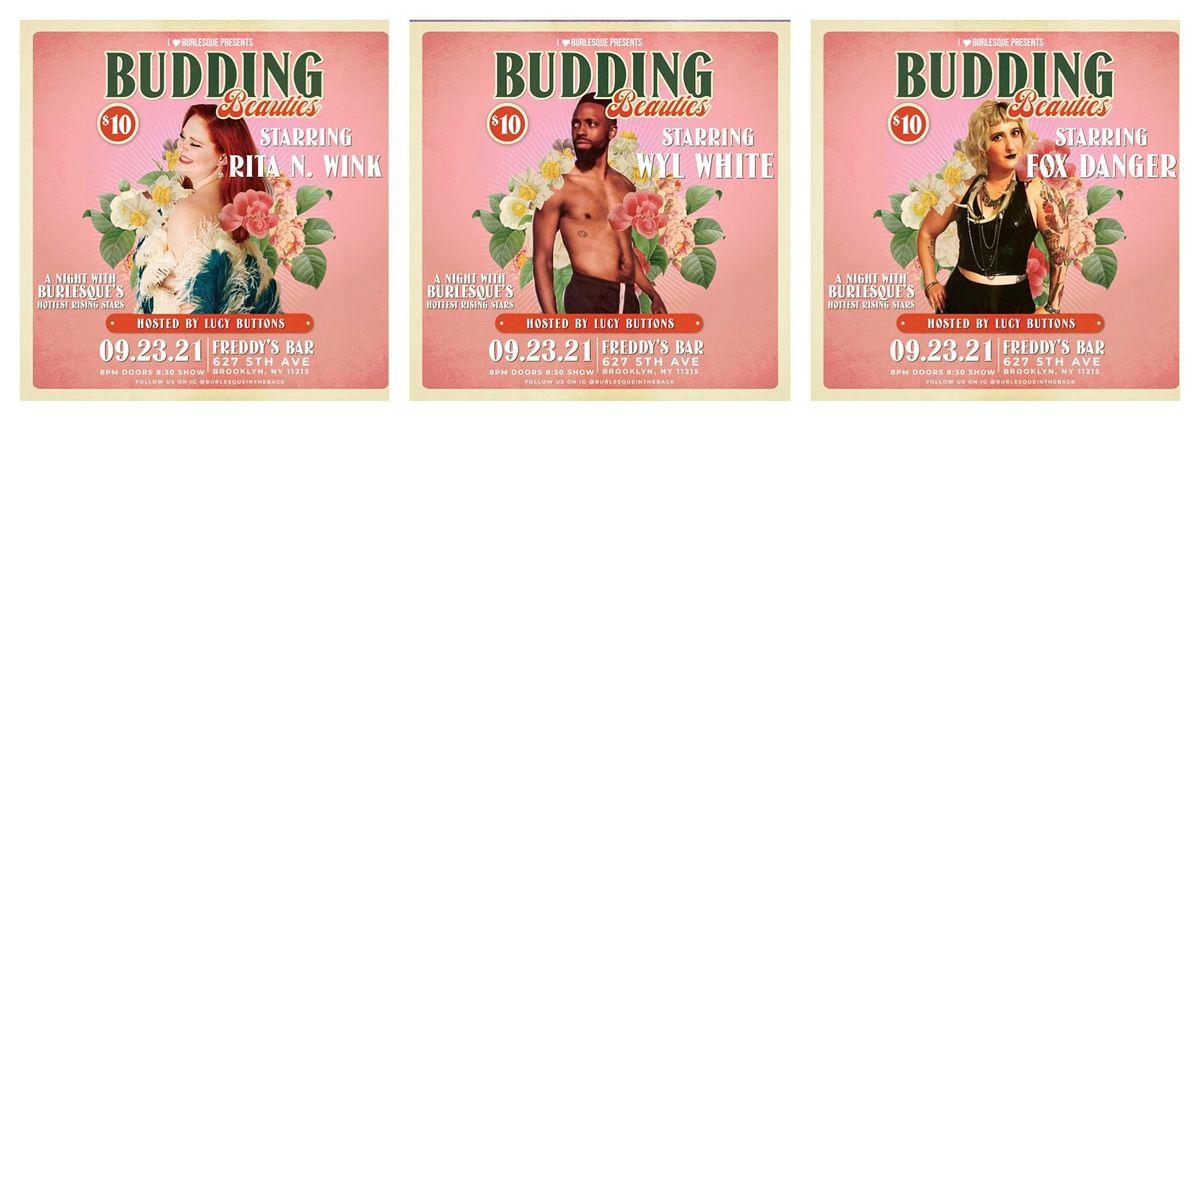 Budding Beauties Burlesque, 23 September | Event in Brooklyn | AllEvents.in